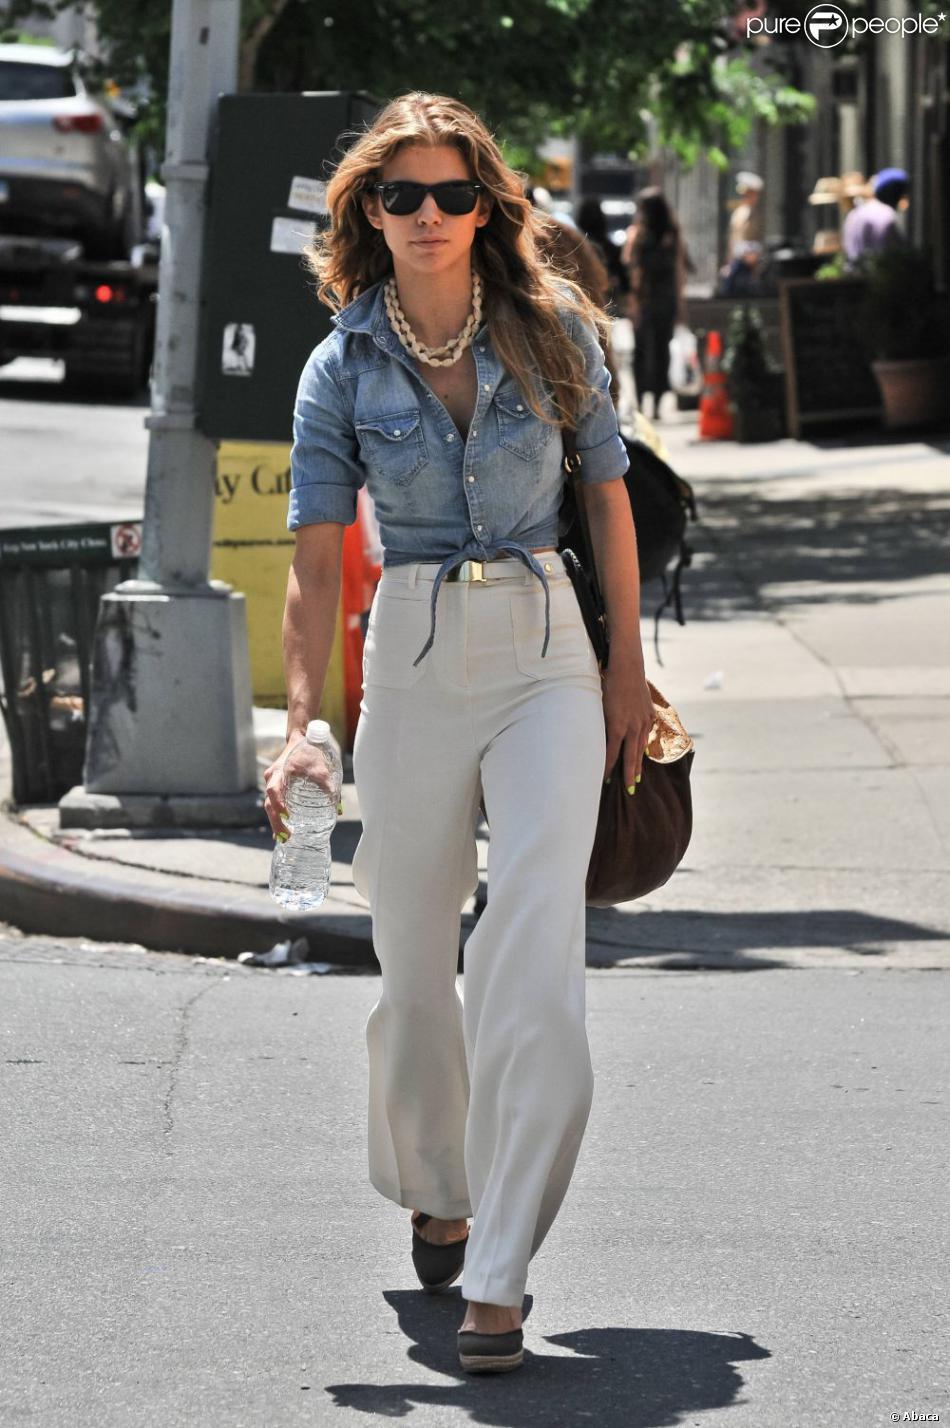 annalynne mccord opte pour un look boh me chic qui lui sied ravir l 39 ensemble pantalon blanc. Black Bedroom Furniture Sets. Home Design Ideas